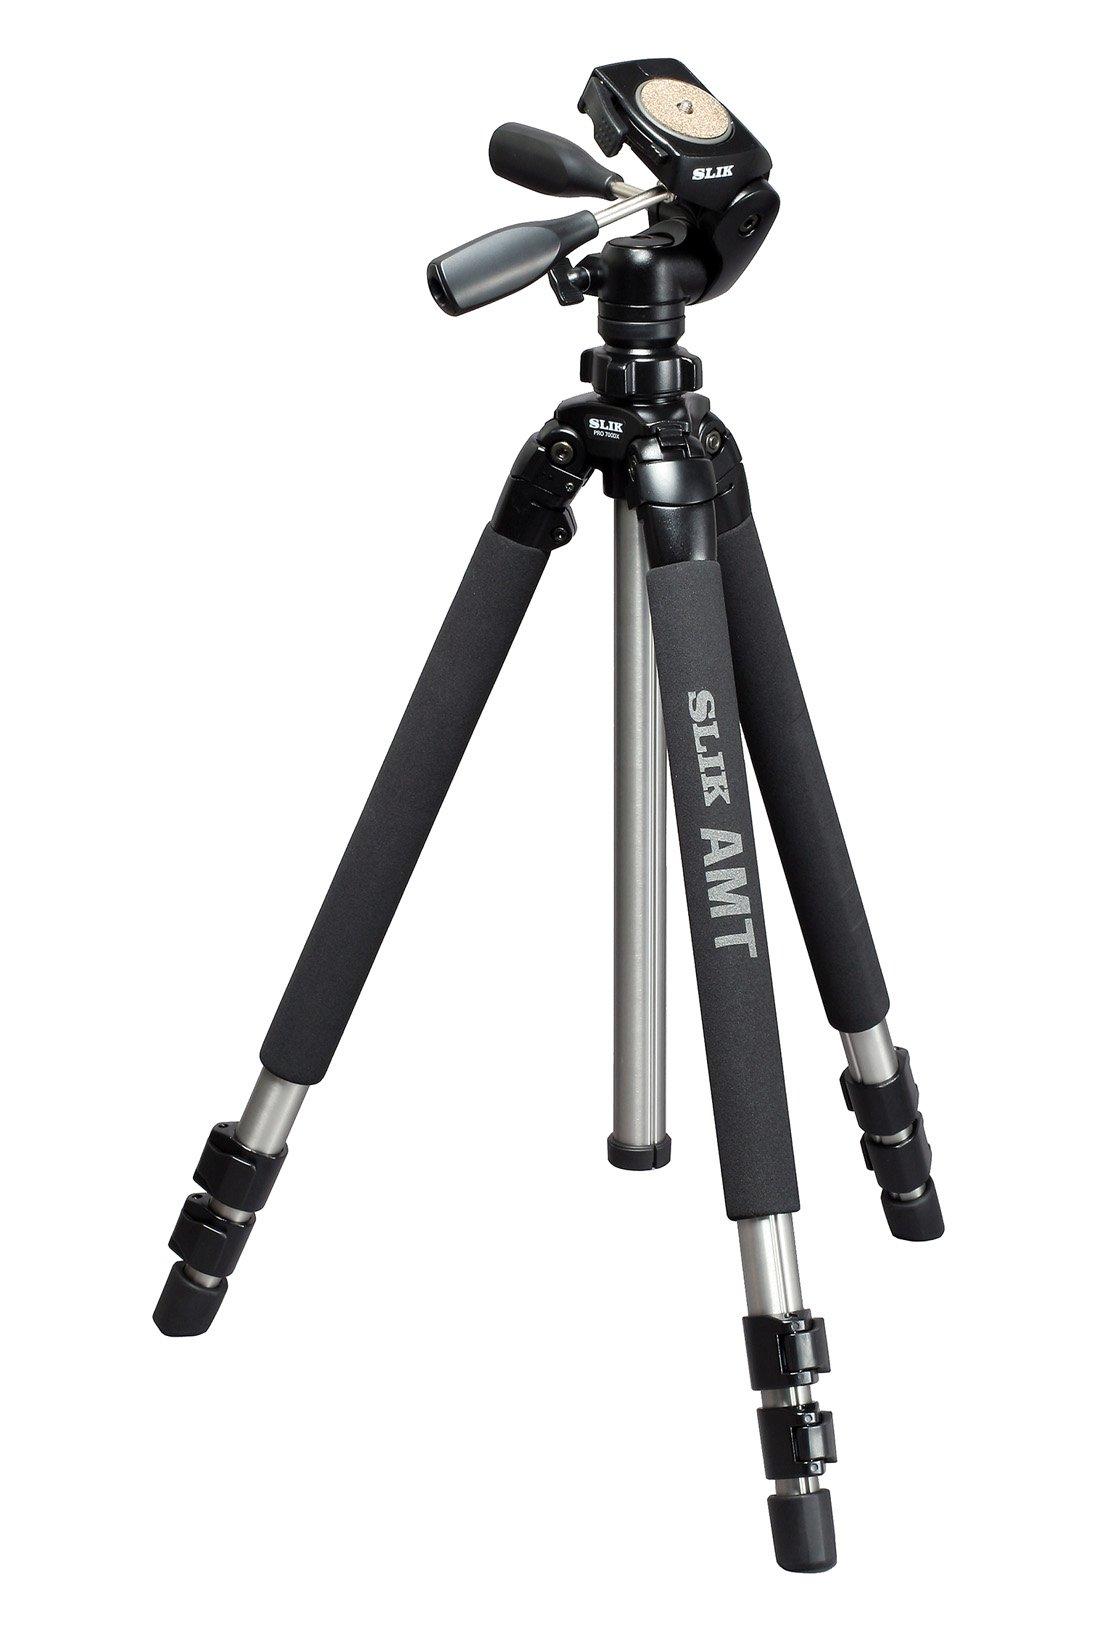 SLIK Pro 700 DX Tripod with 700DX 3-Way, Pan-and-Tilt Head - Titanium by Slik